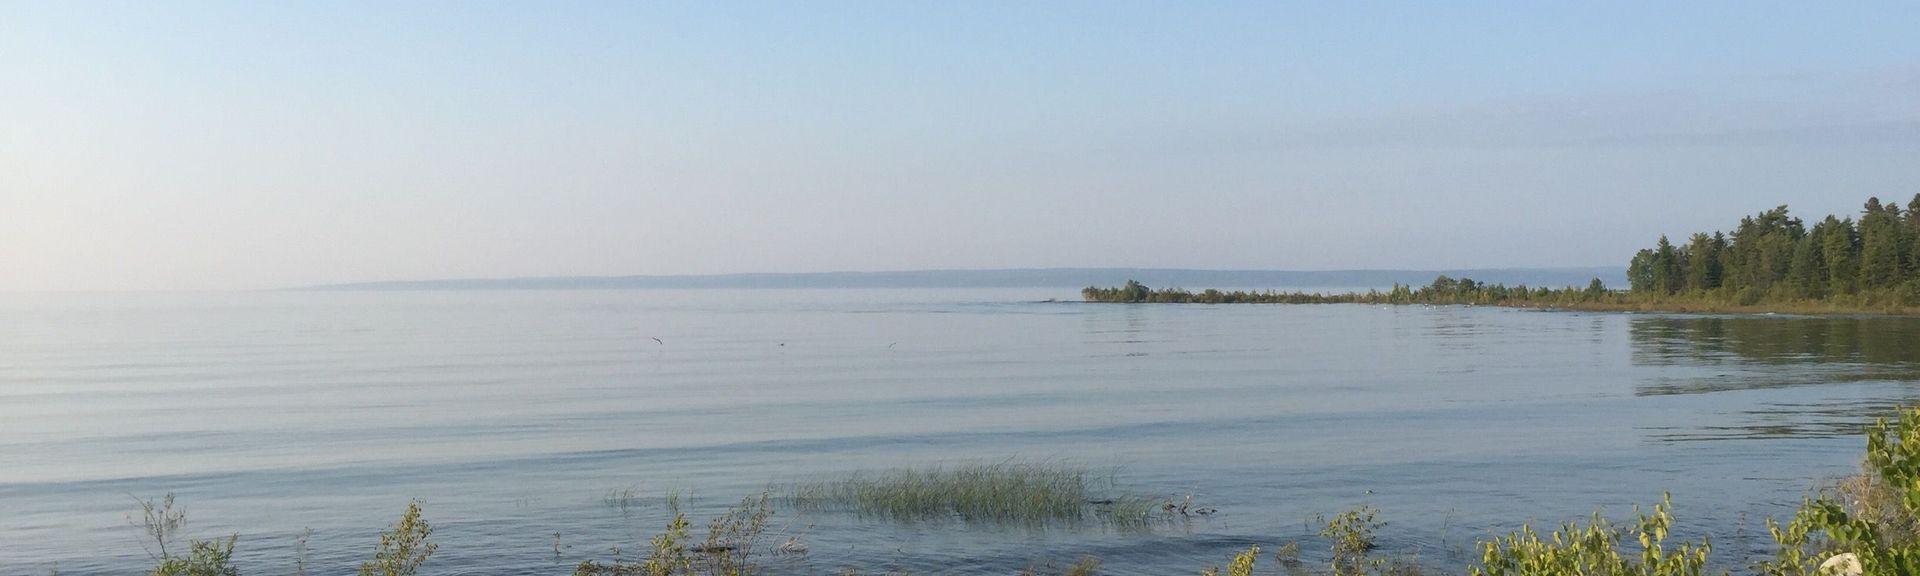 Bay Harbor, Petoskey, Michigan, Stati Uniti d'America